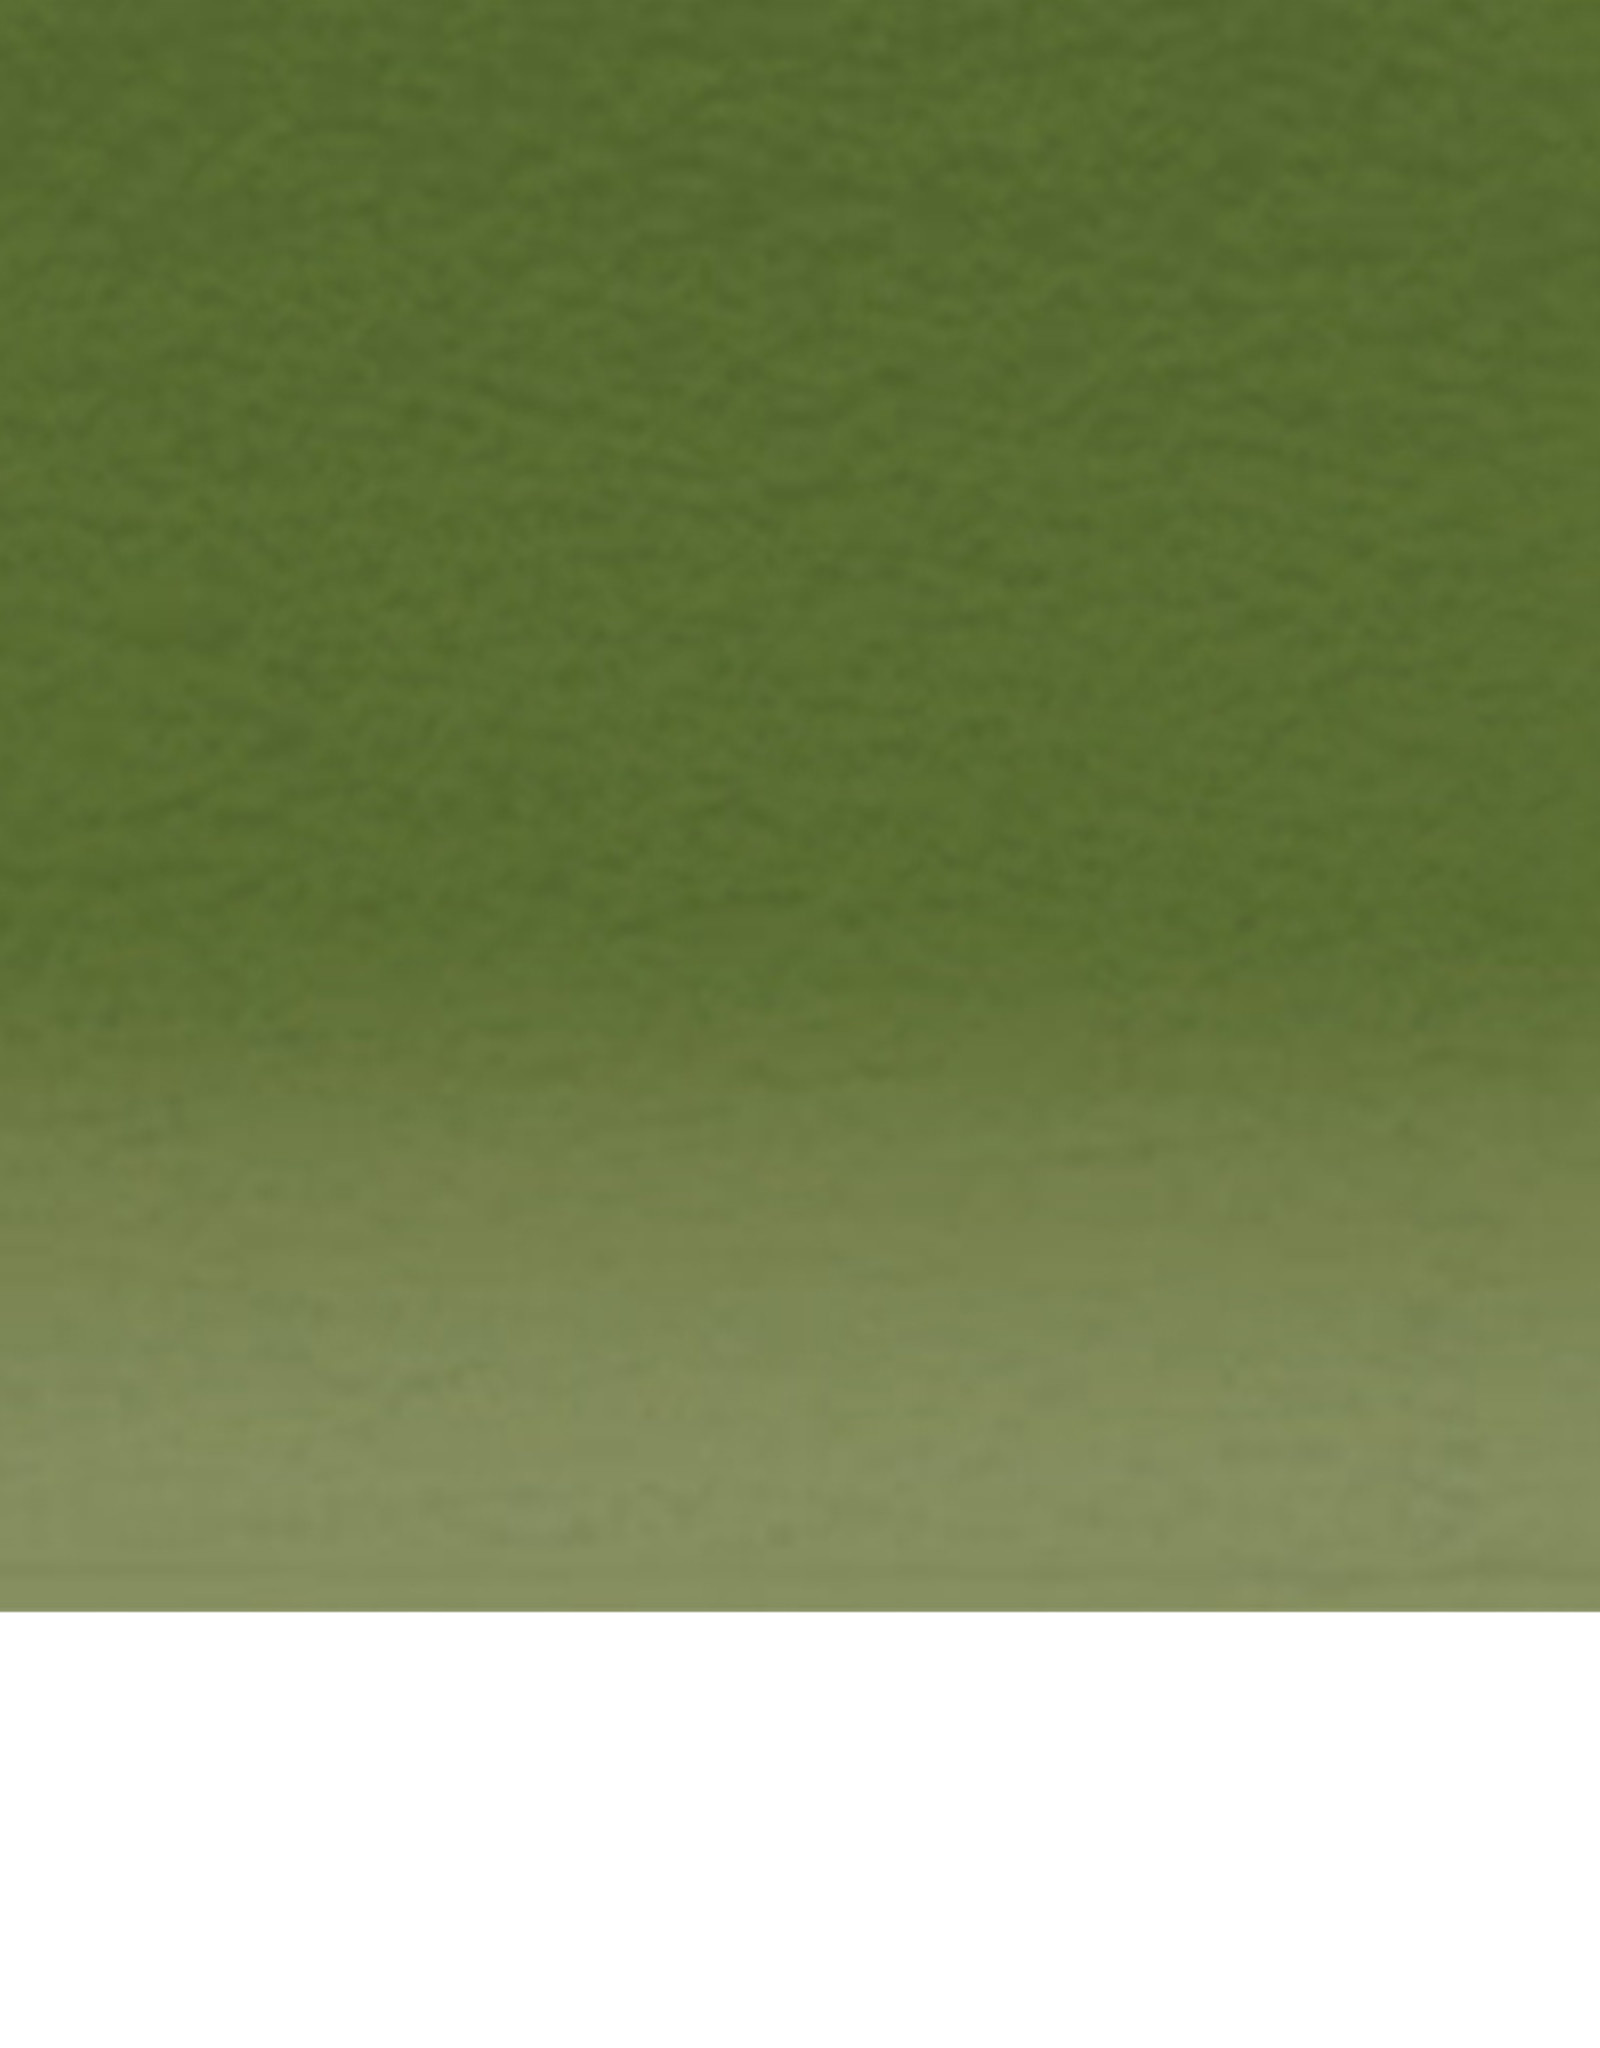 Inktense Potlood Light Olive